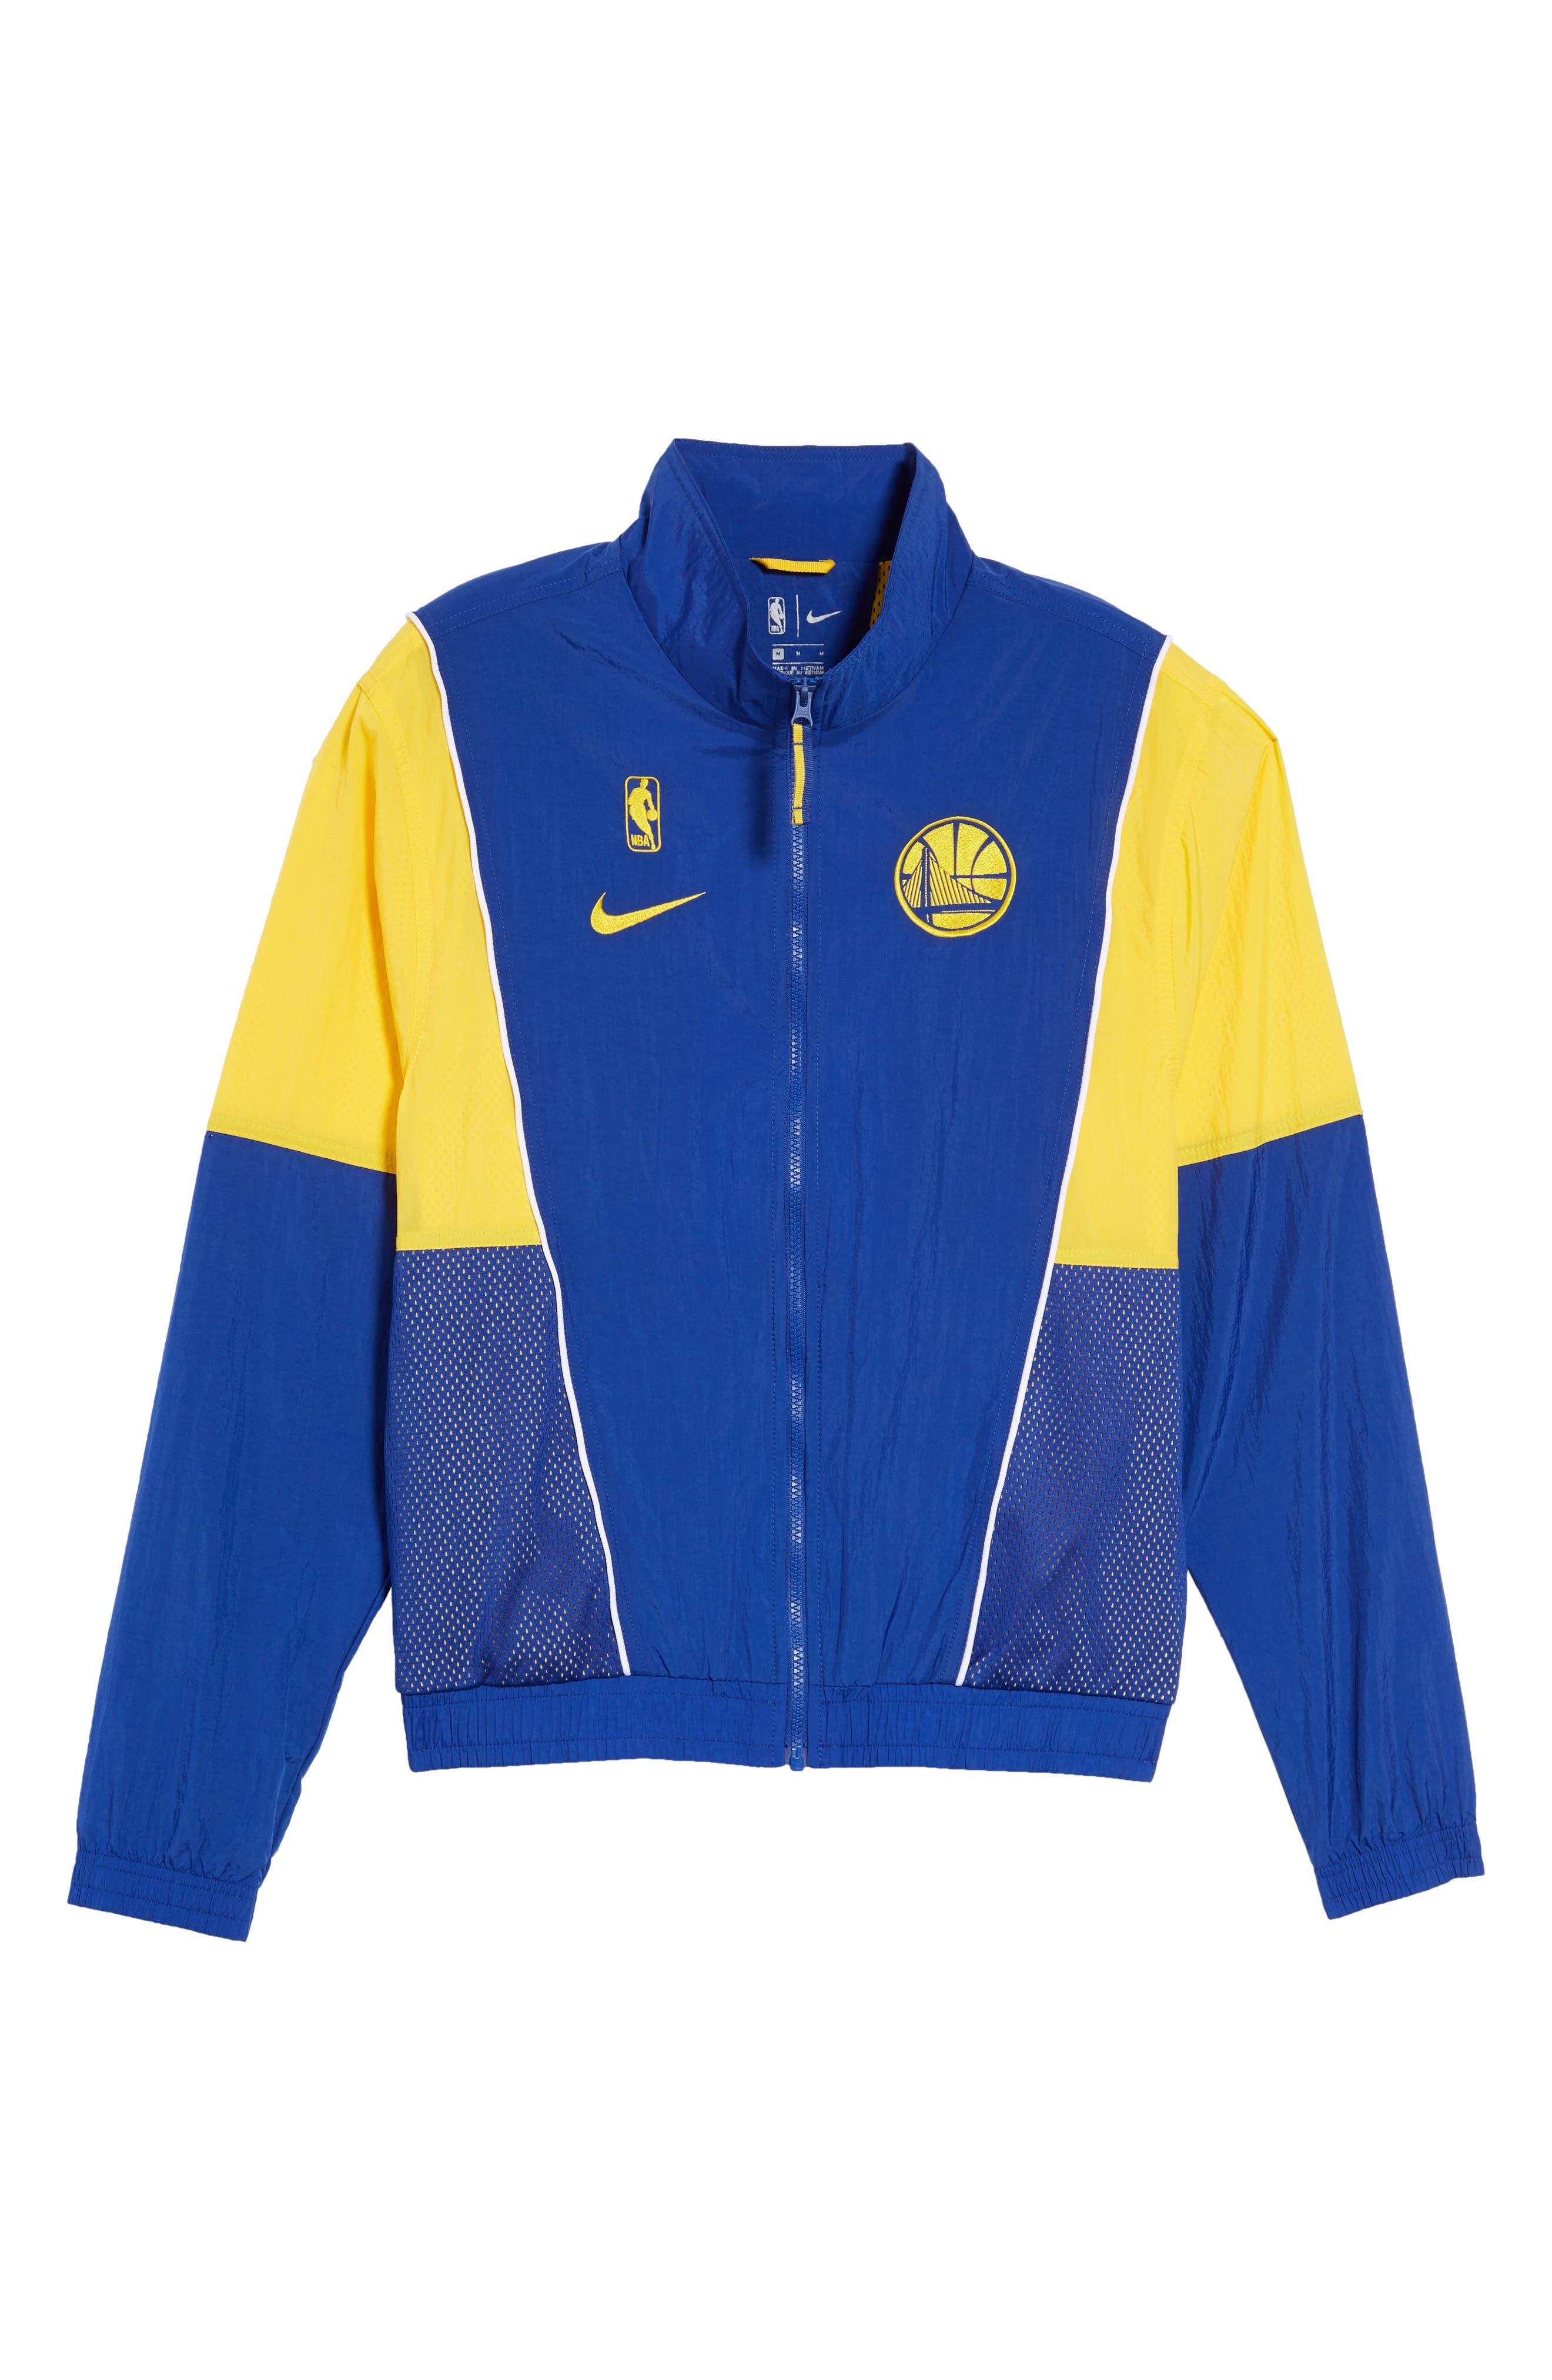 Golden State Warriors Track Jacket,                             Alternate thumbnail 7, color,                             RUSH BLUE/ AMARILLO/ WHITE